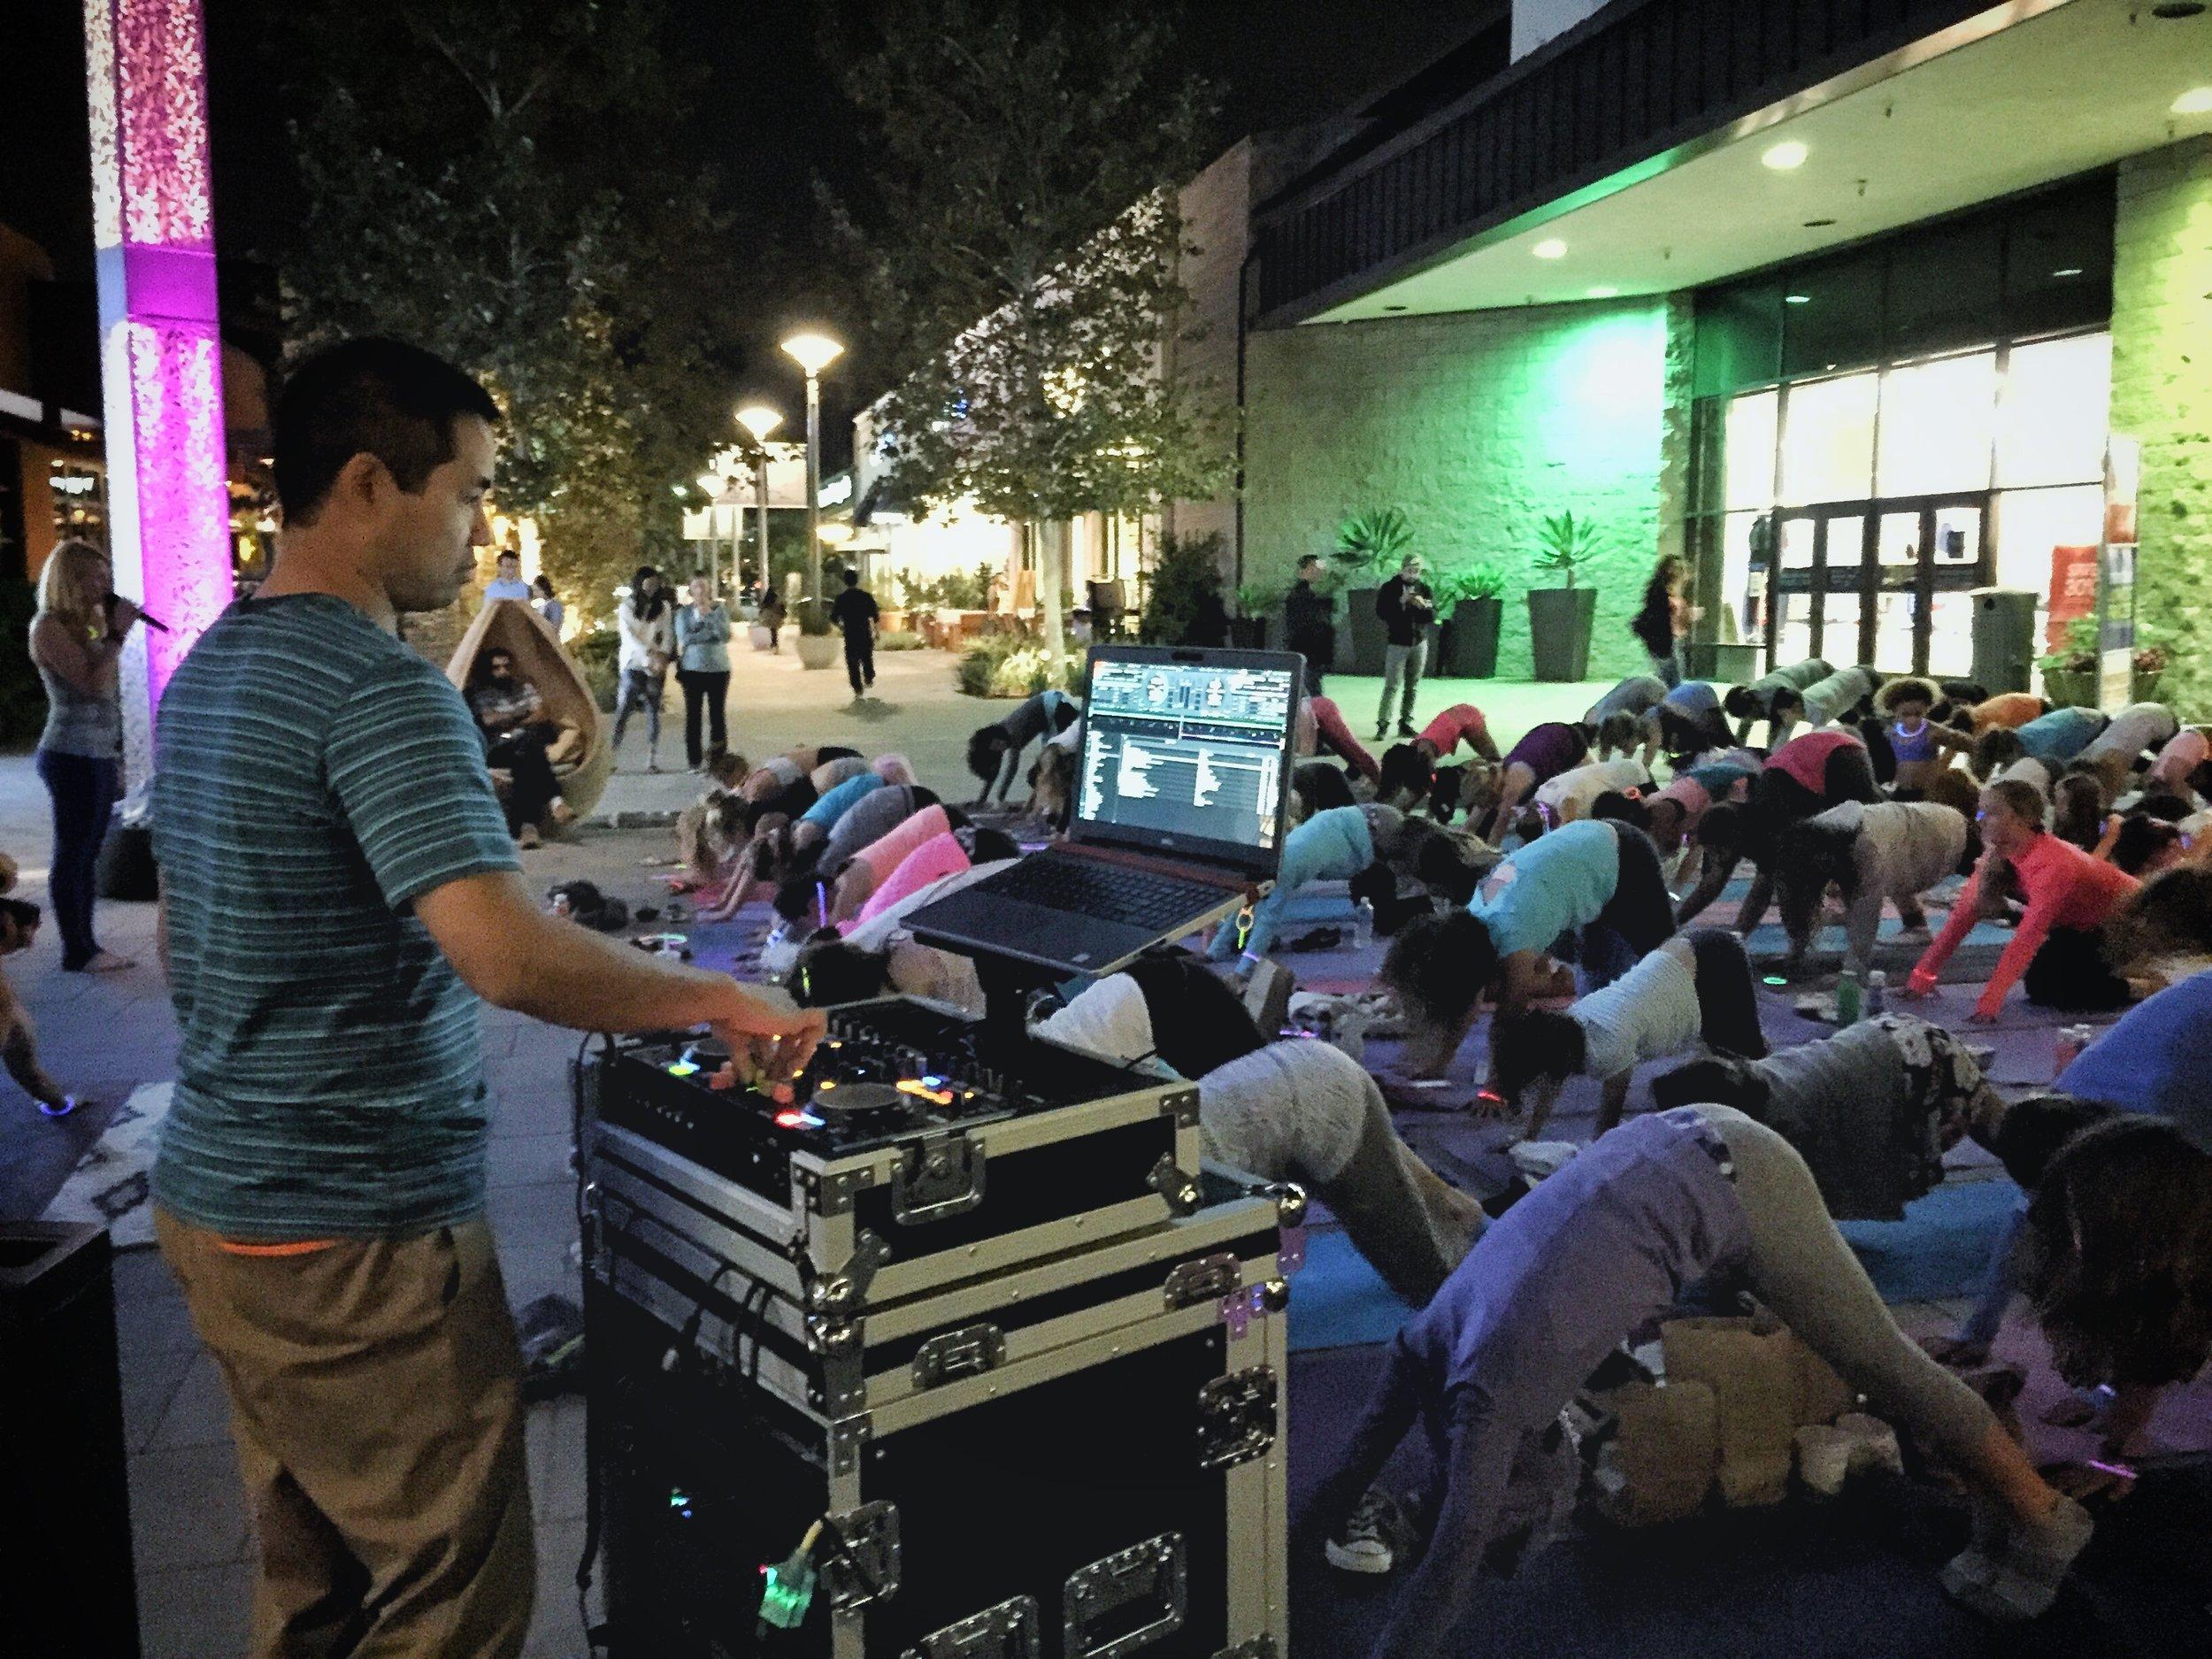 San Diego based yoga DJ Justin Kanoya DJ's the Flow in the Dark event at Westfield UTC.